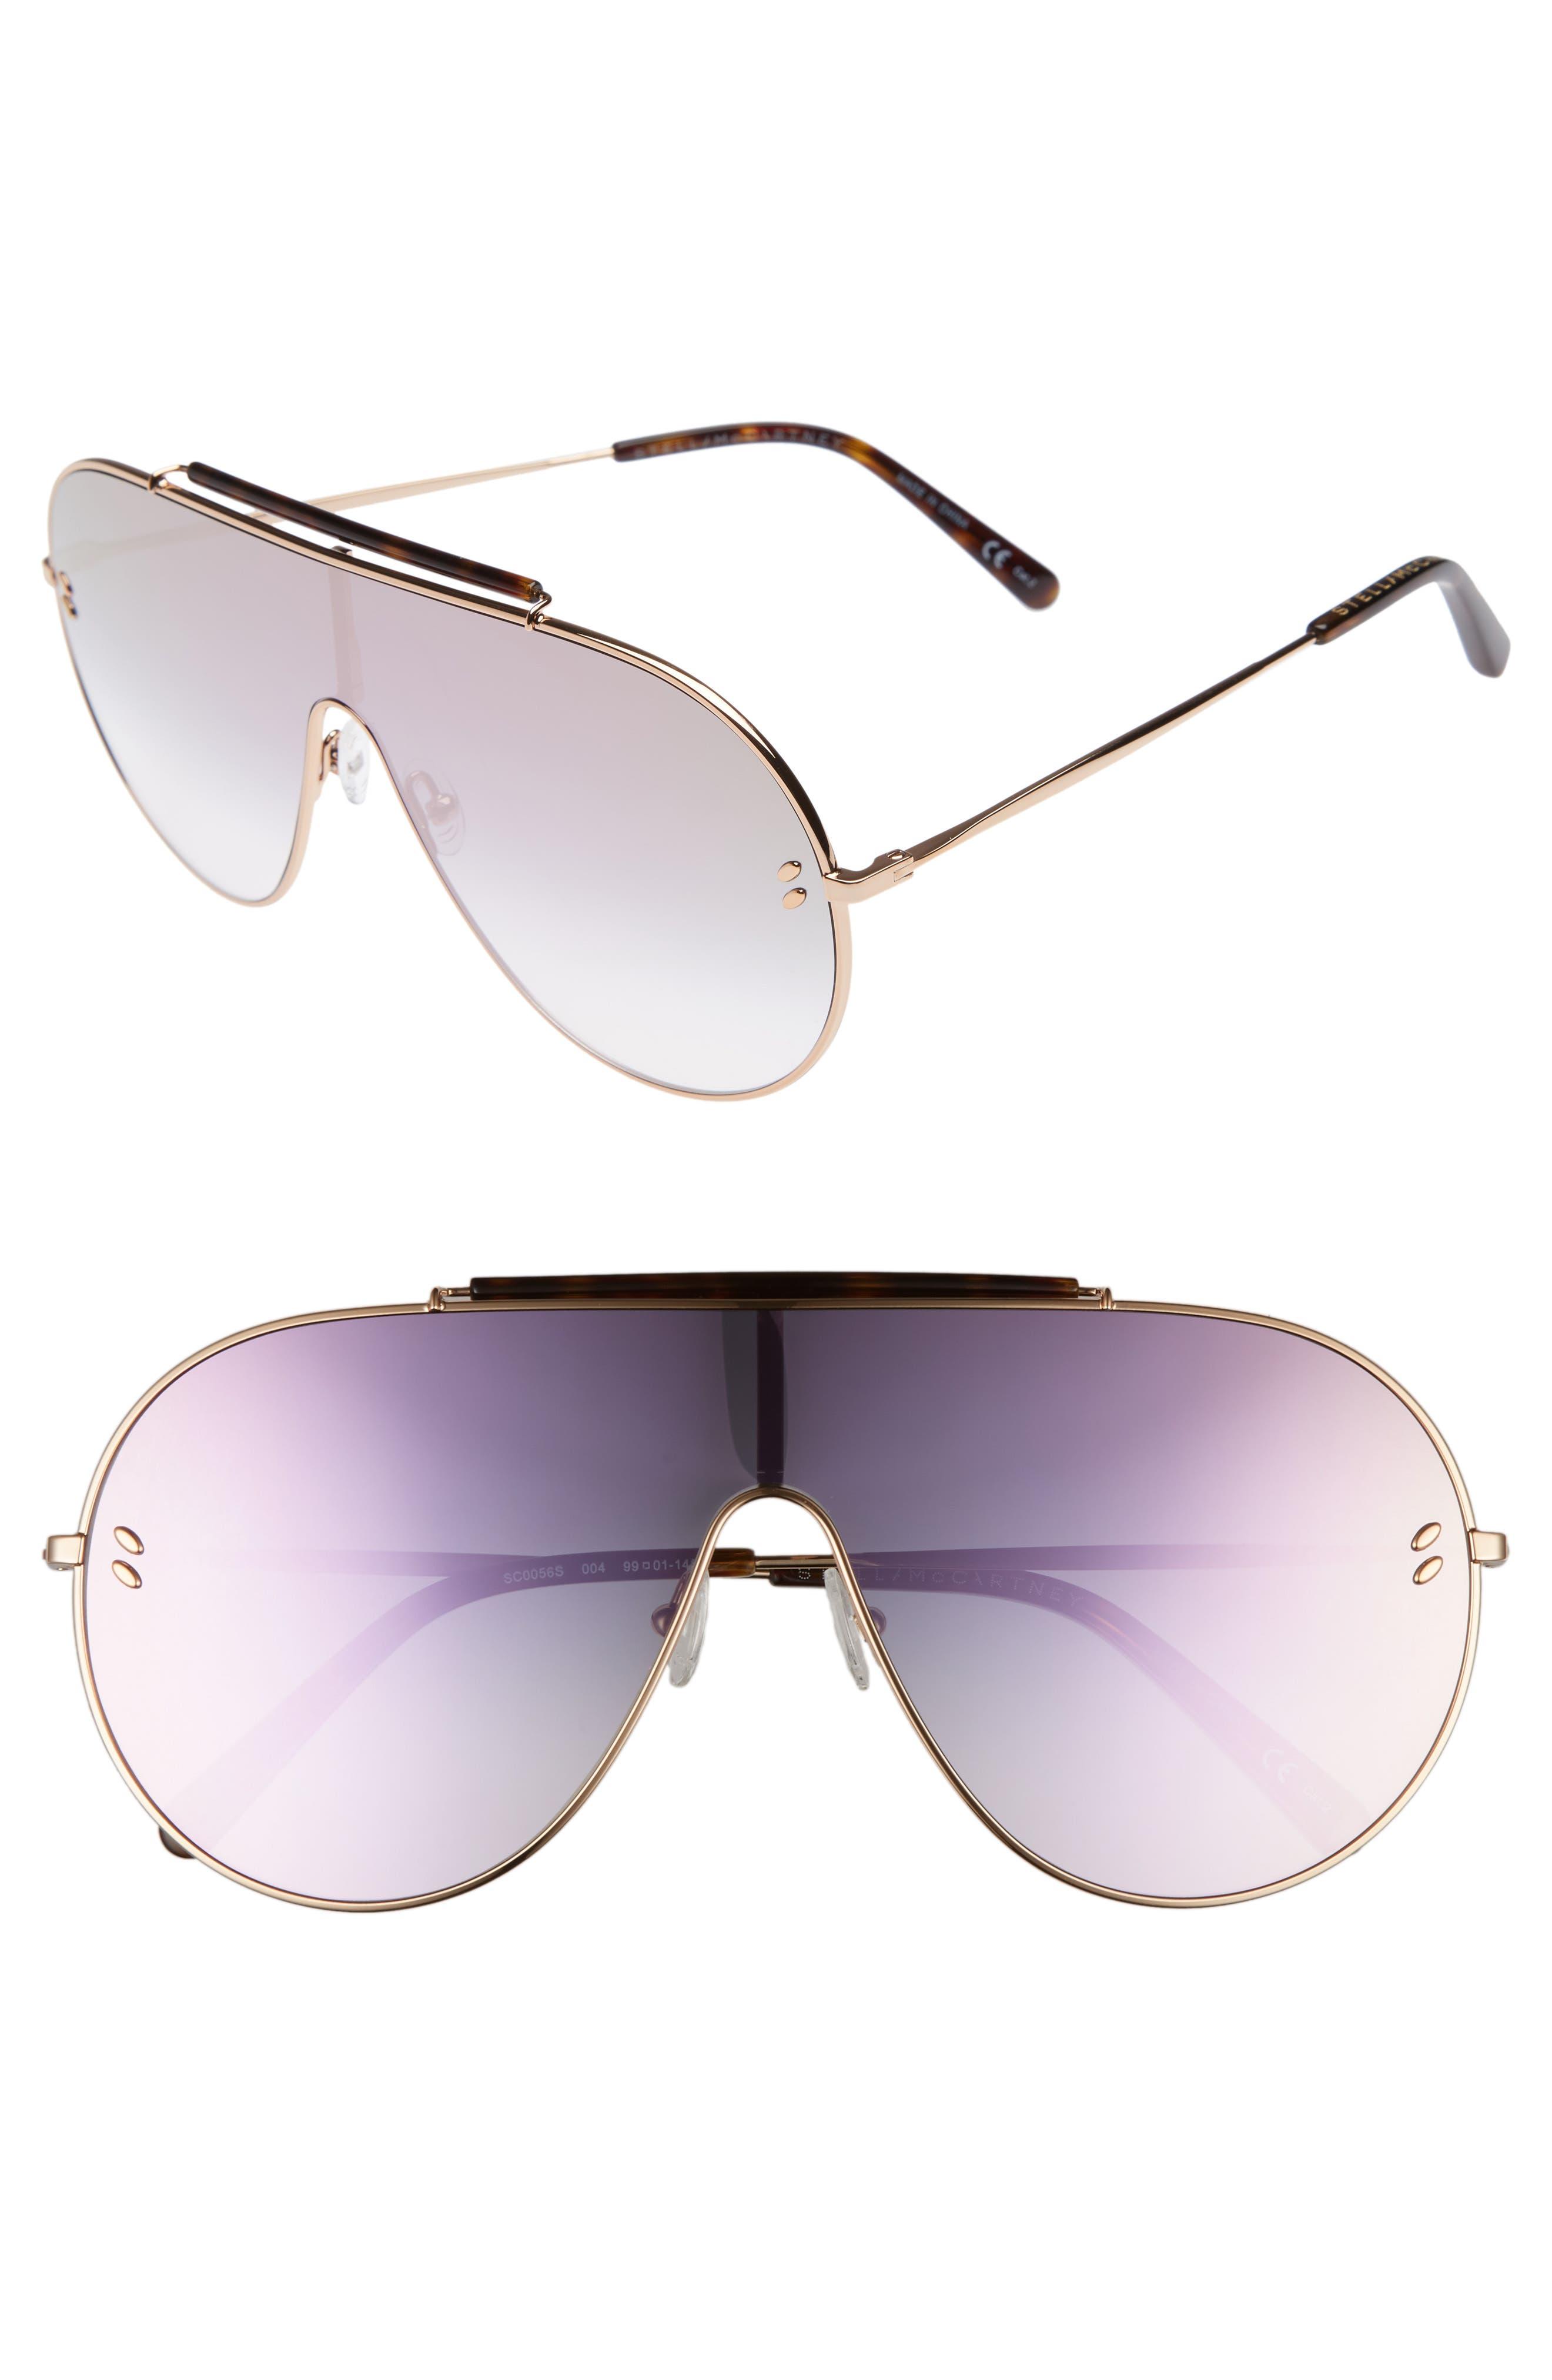 65mm Shield Sunglasses,                         Main,                         color, Gold